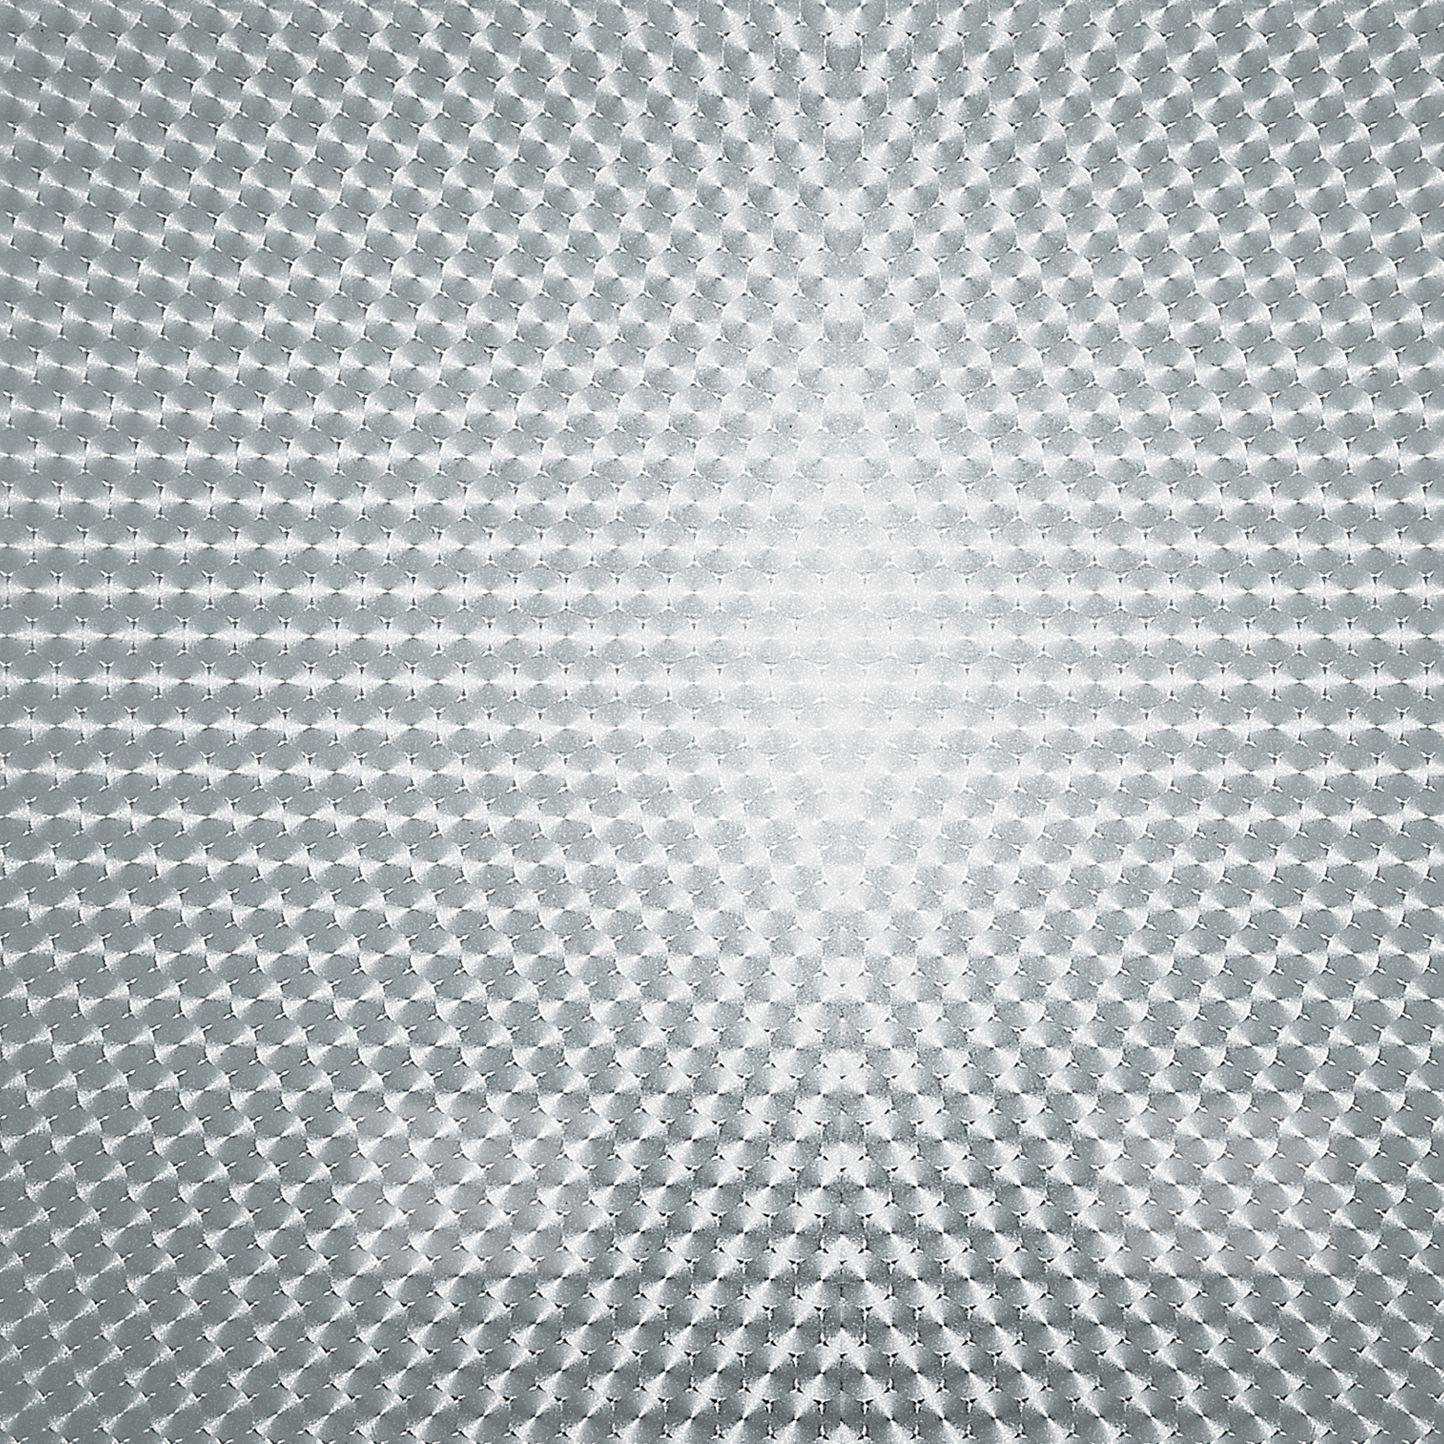 D C Fix Circles Metallic Effect Self Adhesive Window Film